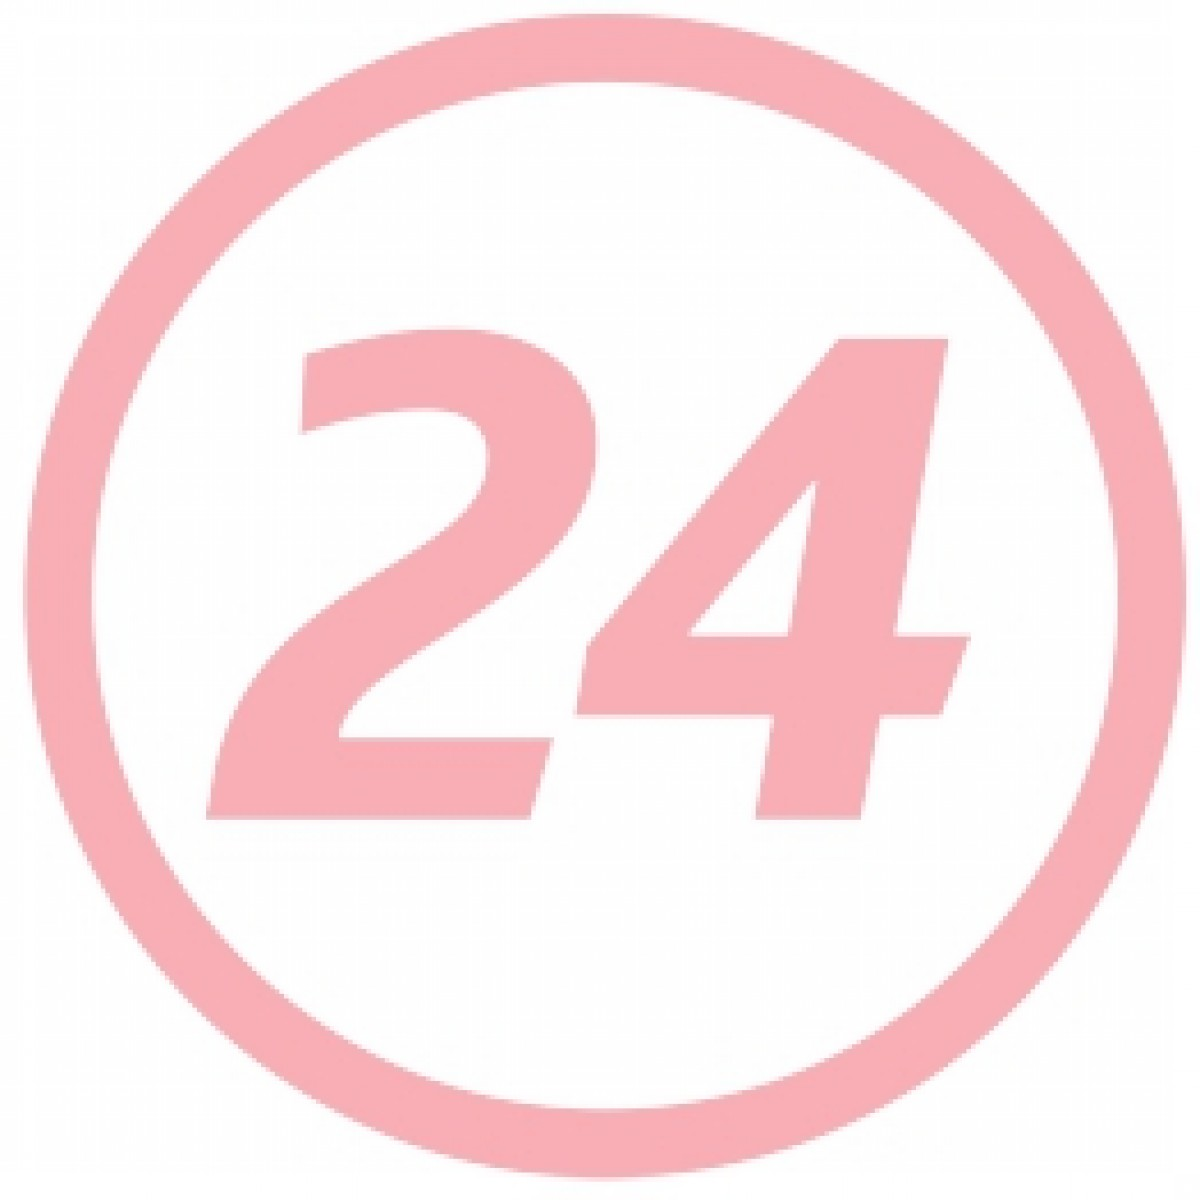 Pansament Adeziv Steril 5cm x 7cm, Pansament, 1buc